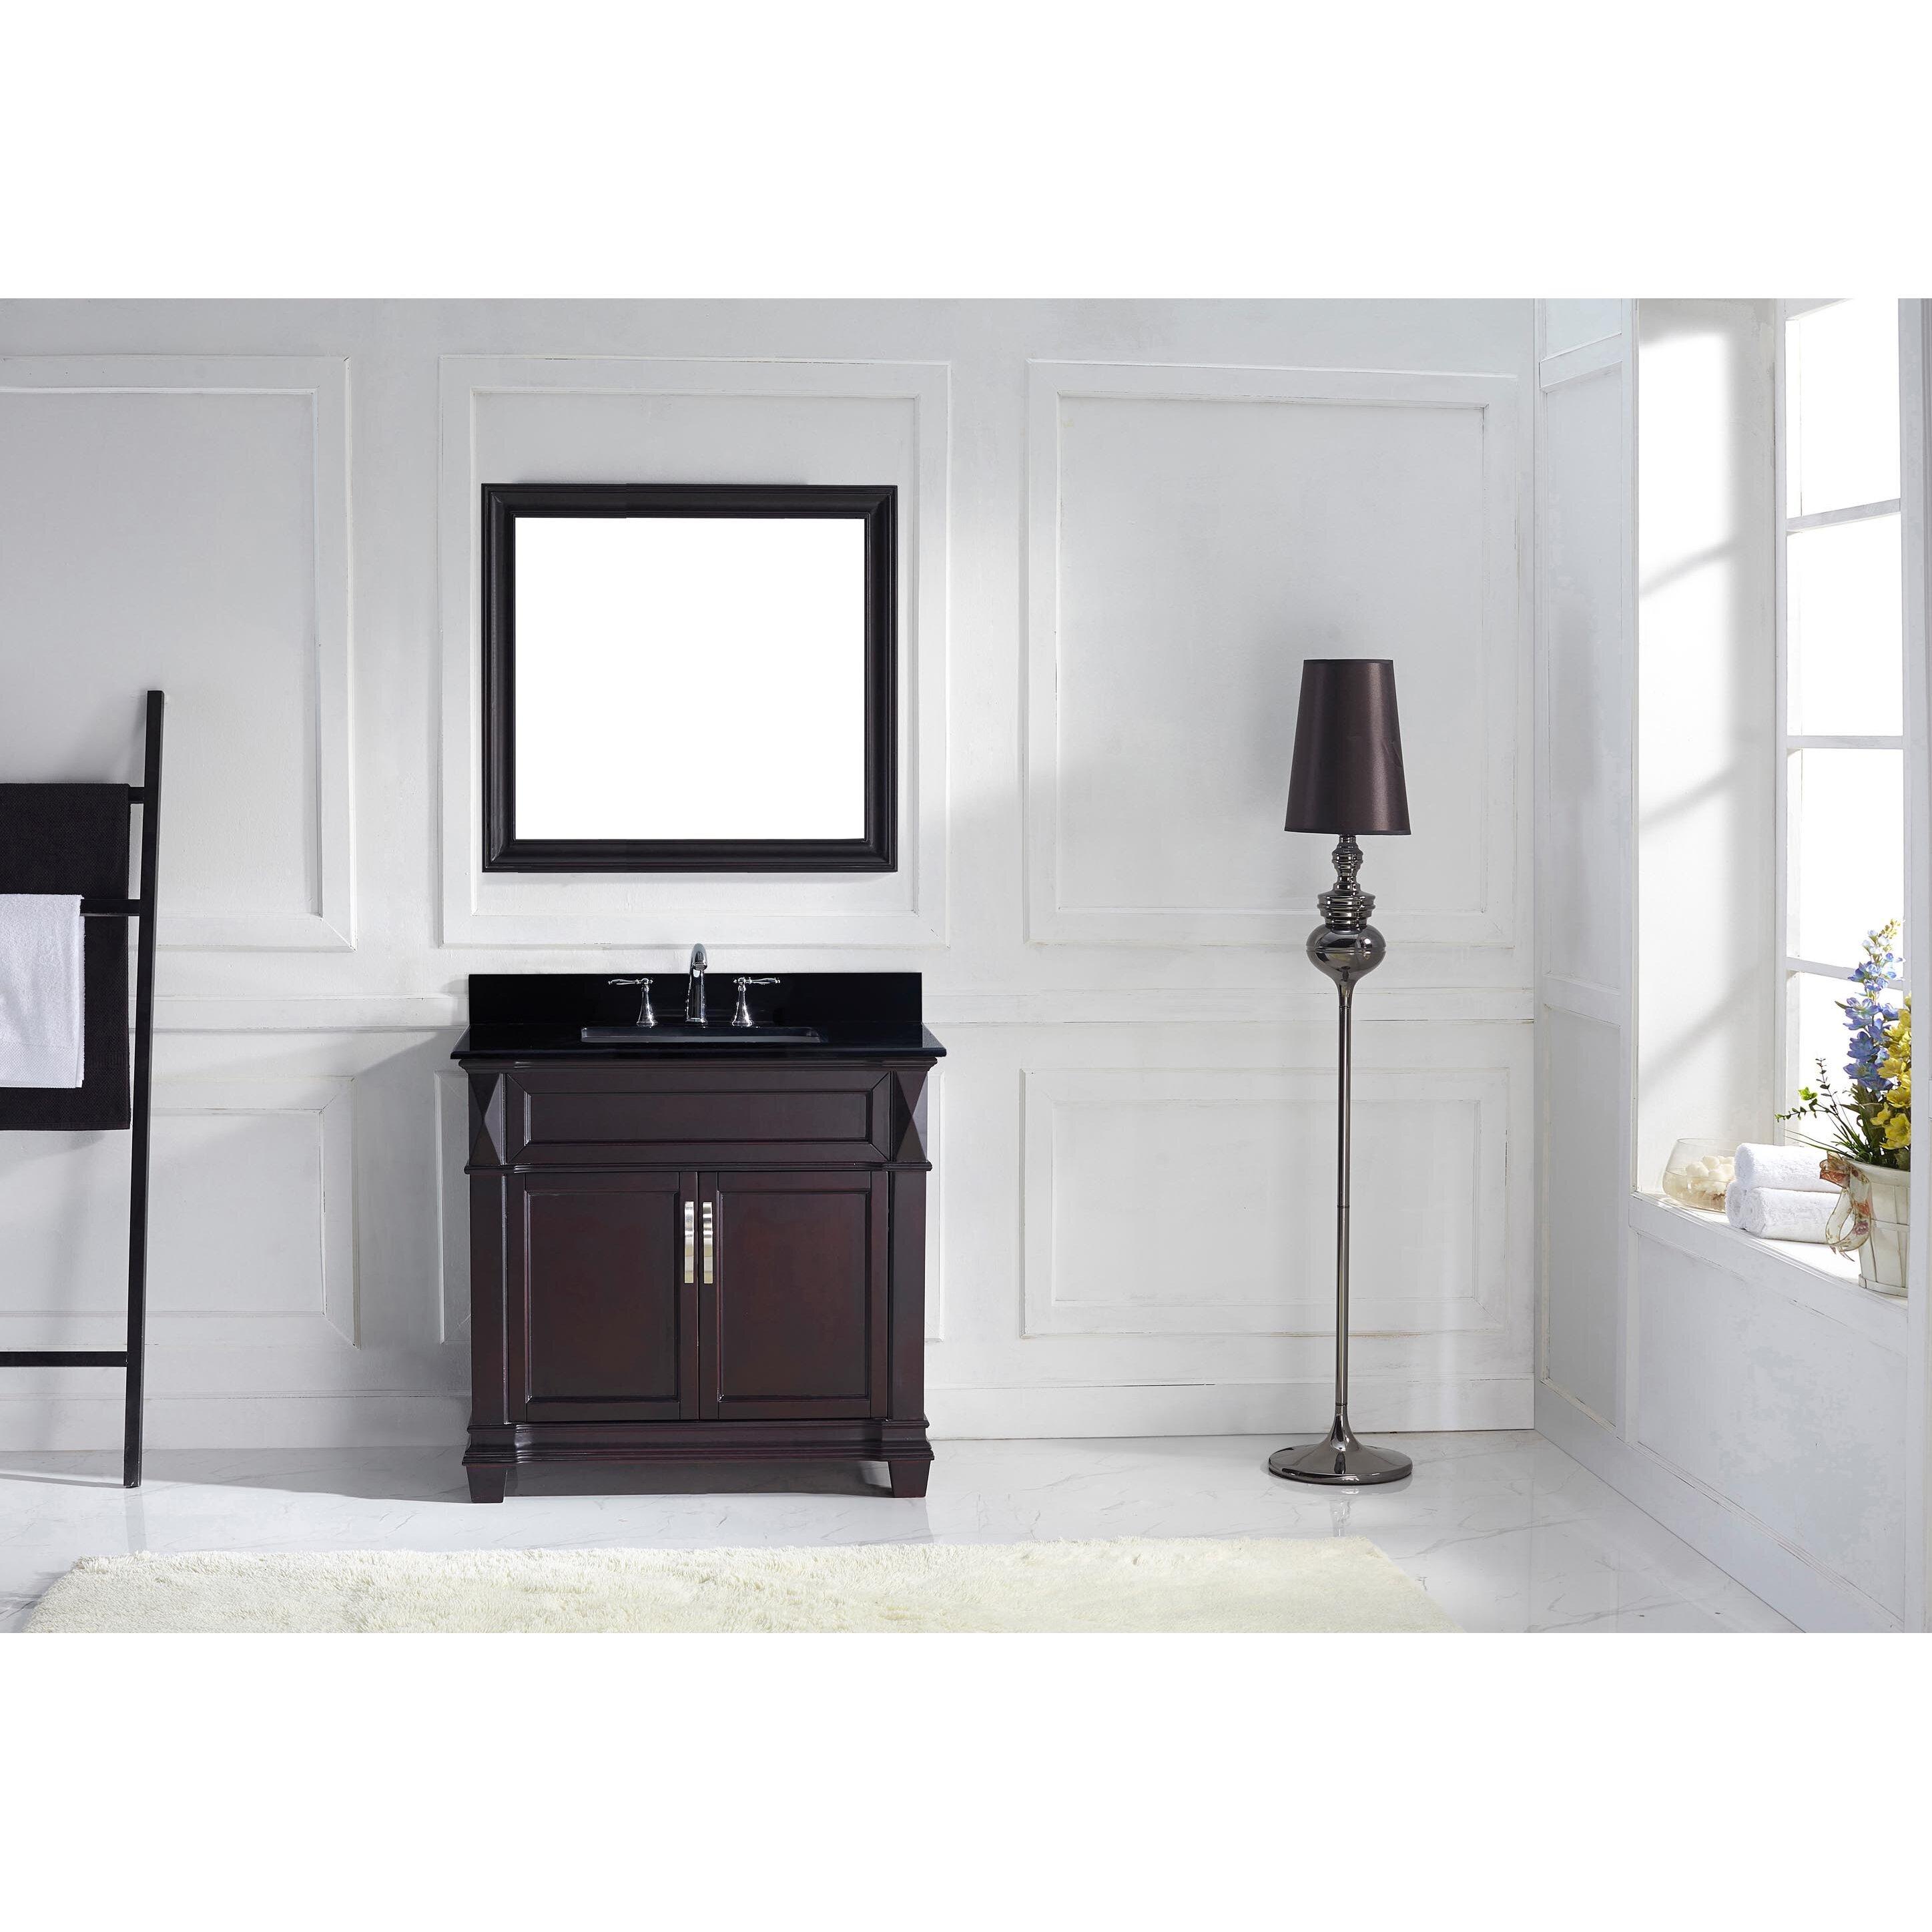 virtu victoria 36 single bathroom vanity set with black galaxy top